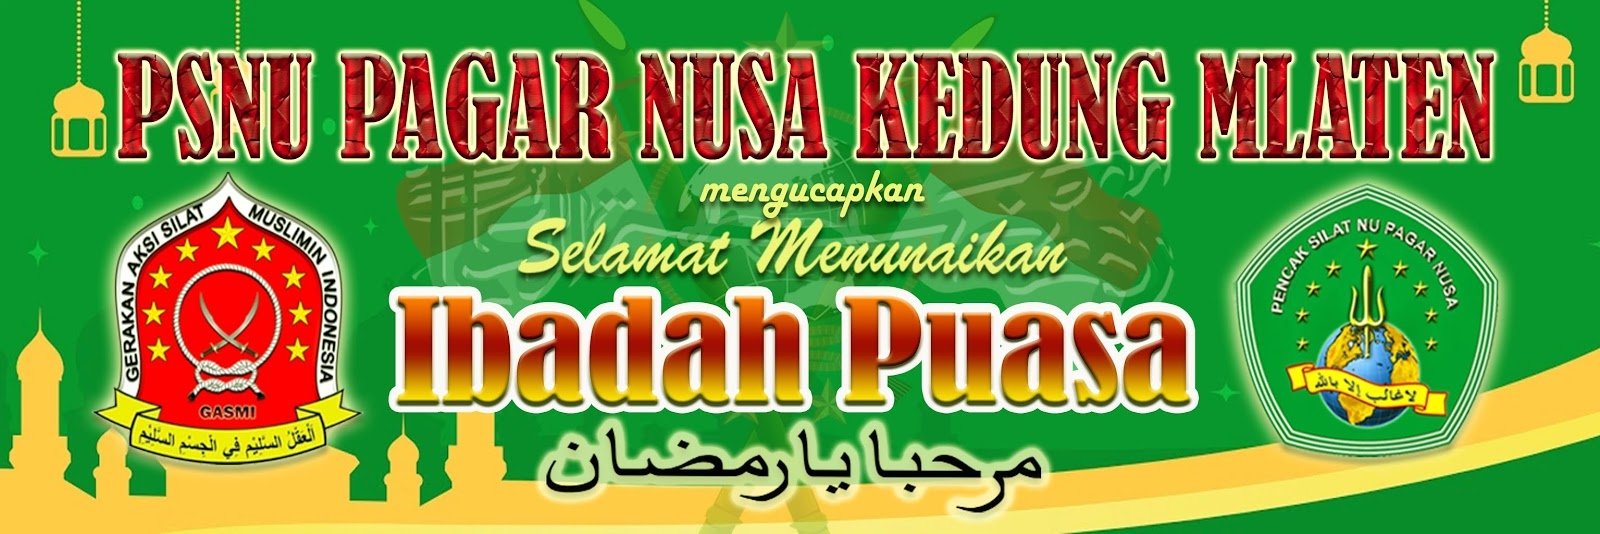 Contoh Banner Selamat Ramadhan Pagar Nusa Kedung Mlaten Hijau X M